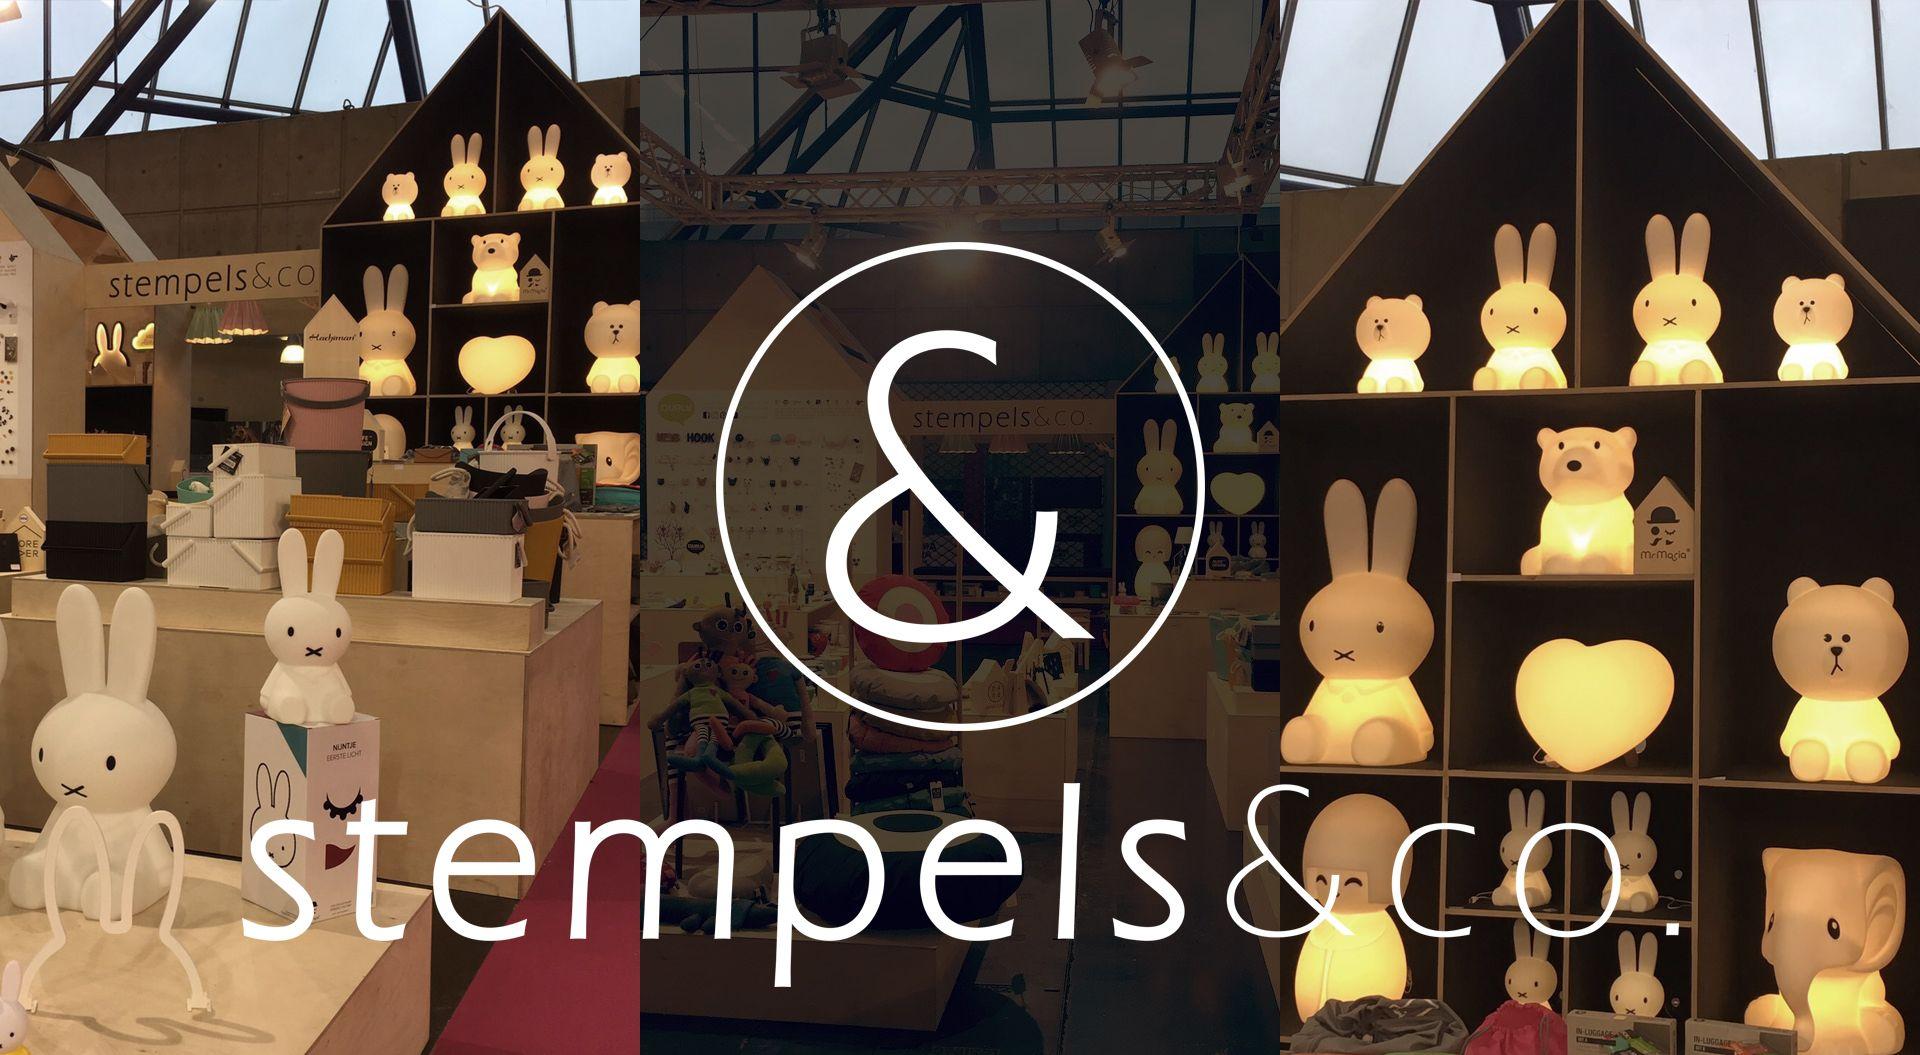 Mr Maria Stempels & Co at Maison & Objet